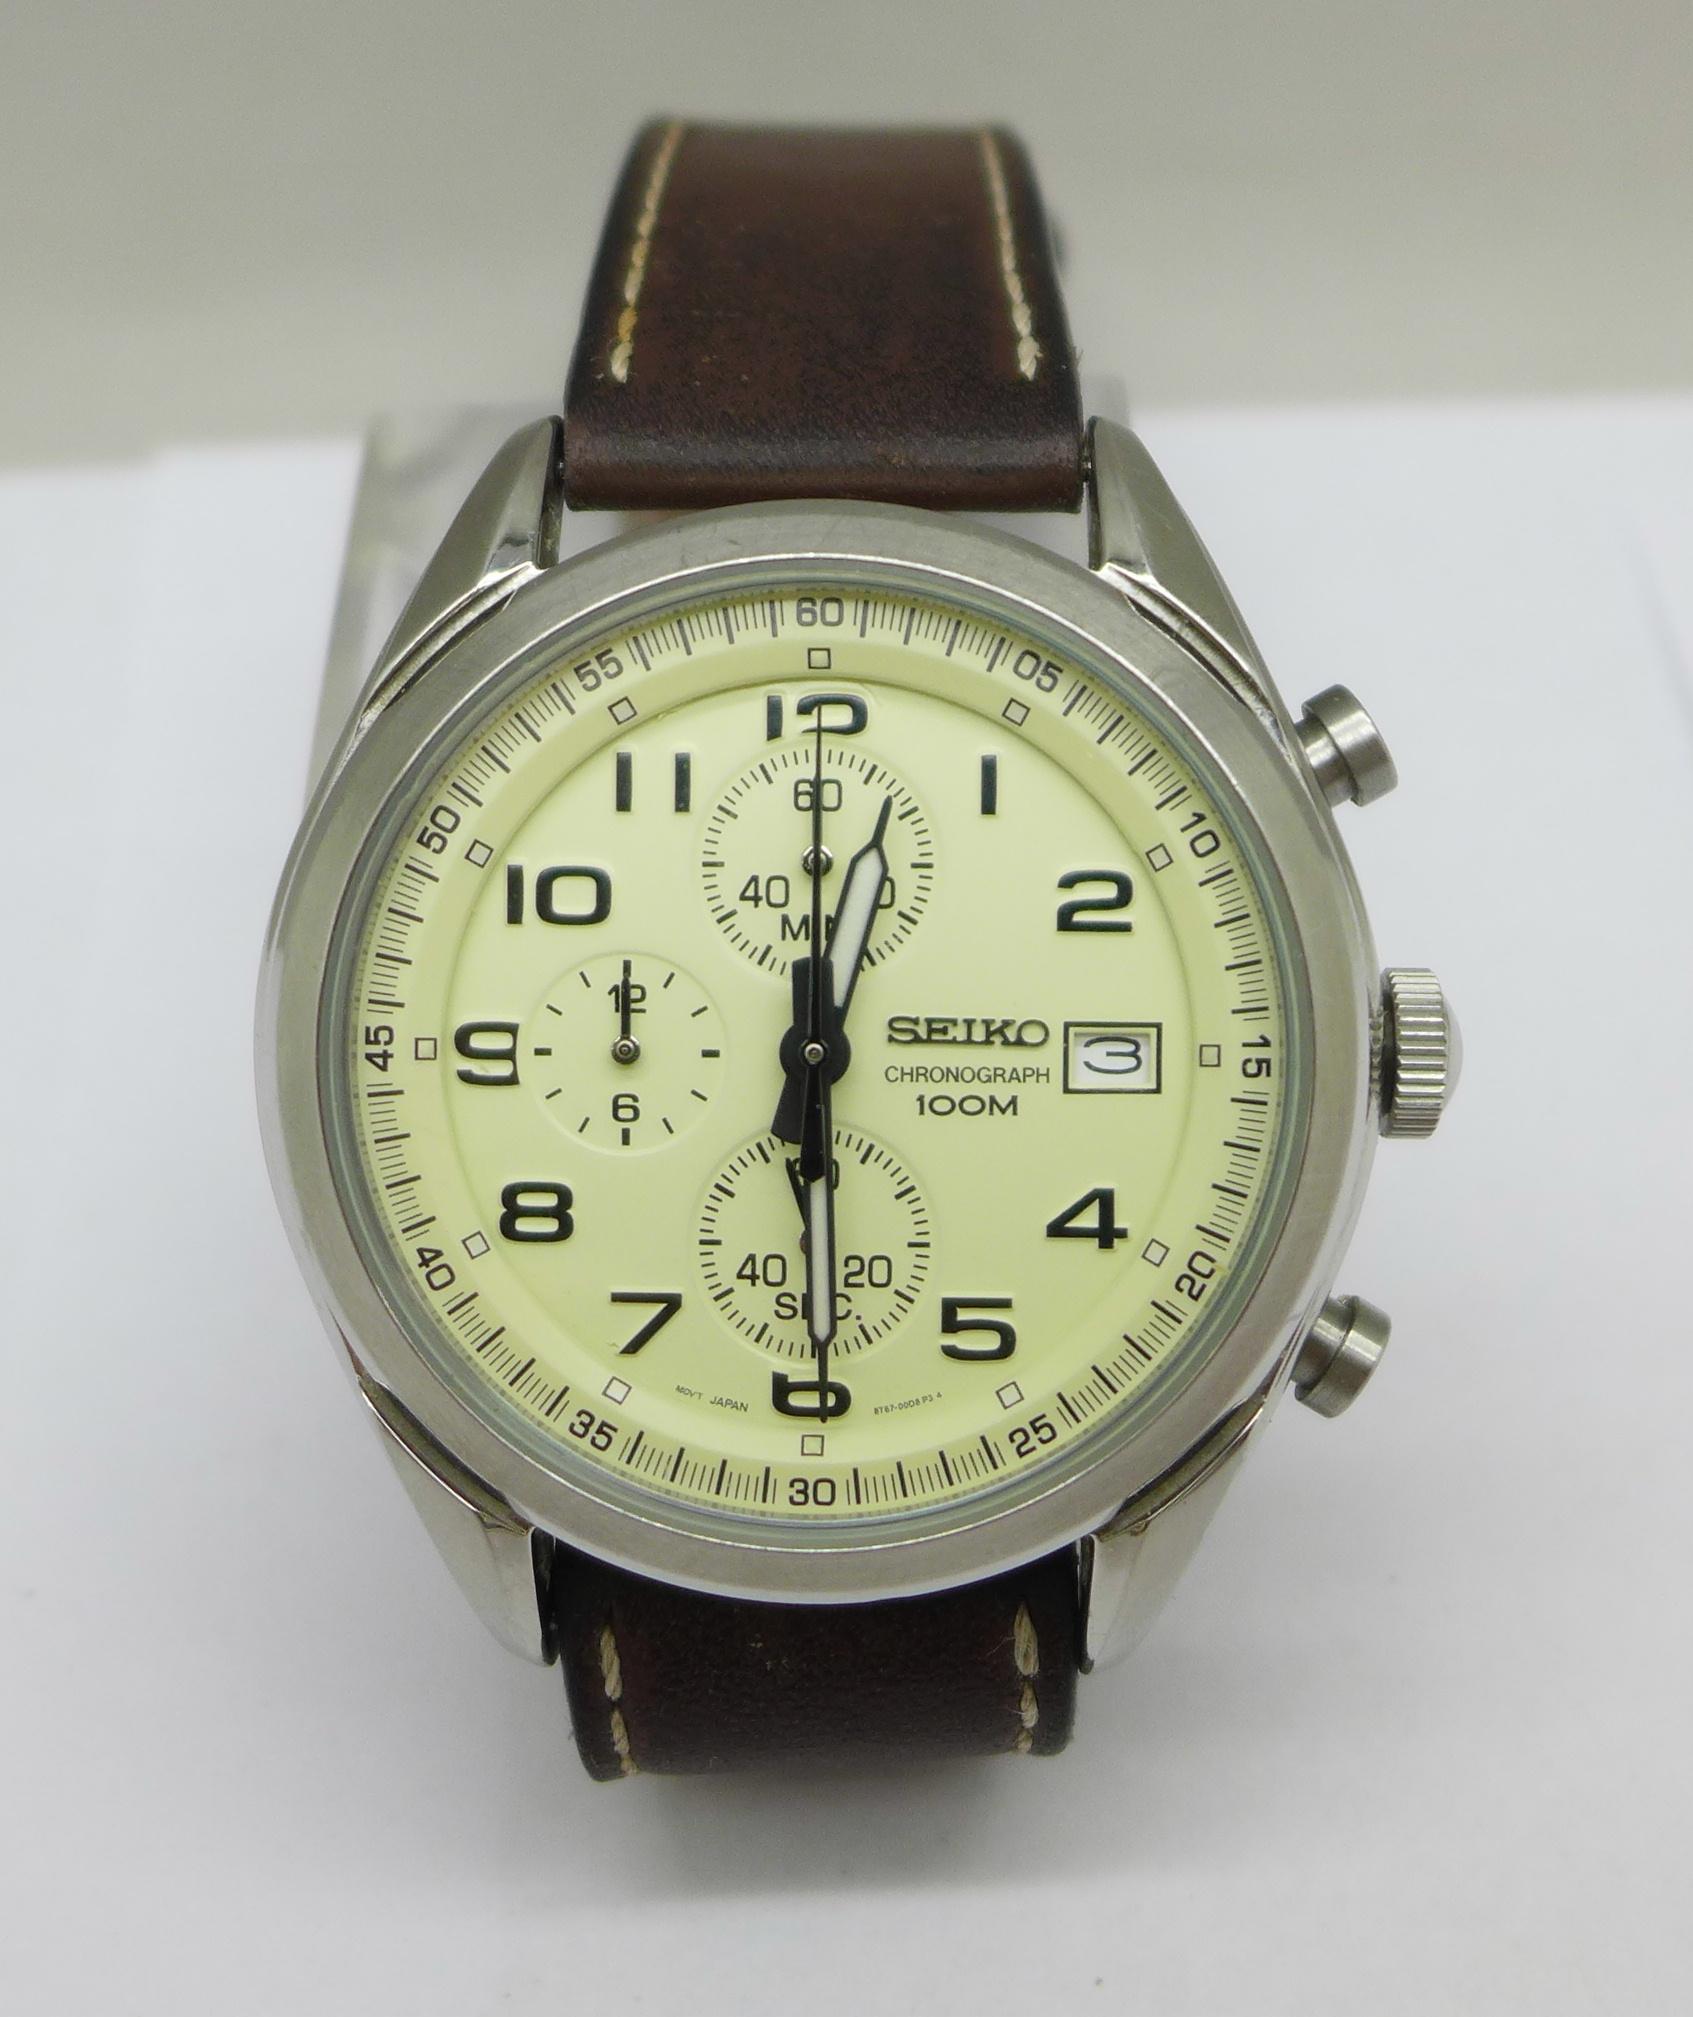 A Seiko chronograph wristwatch